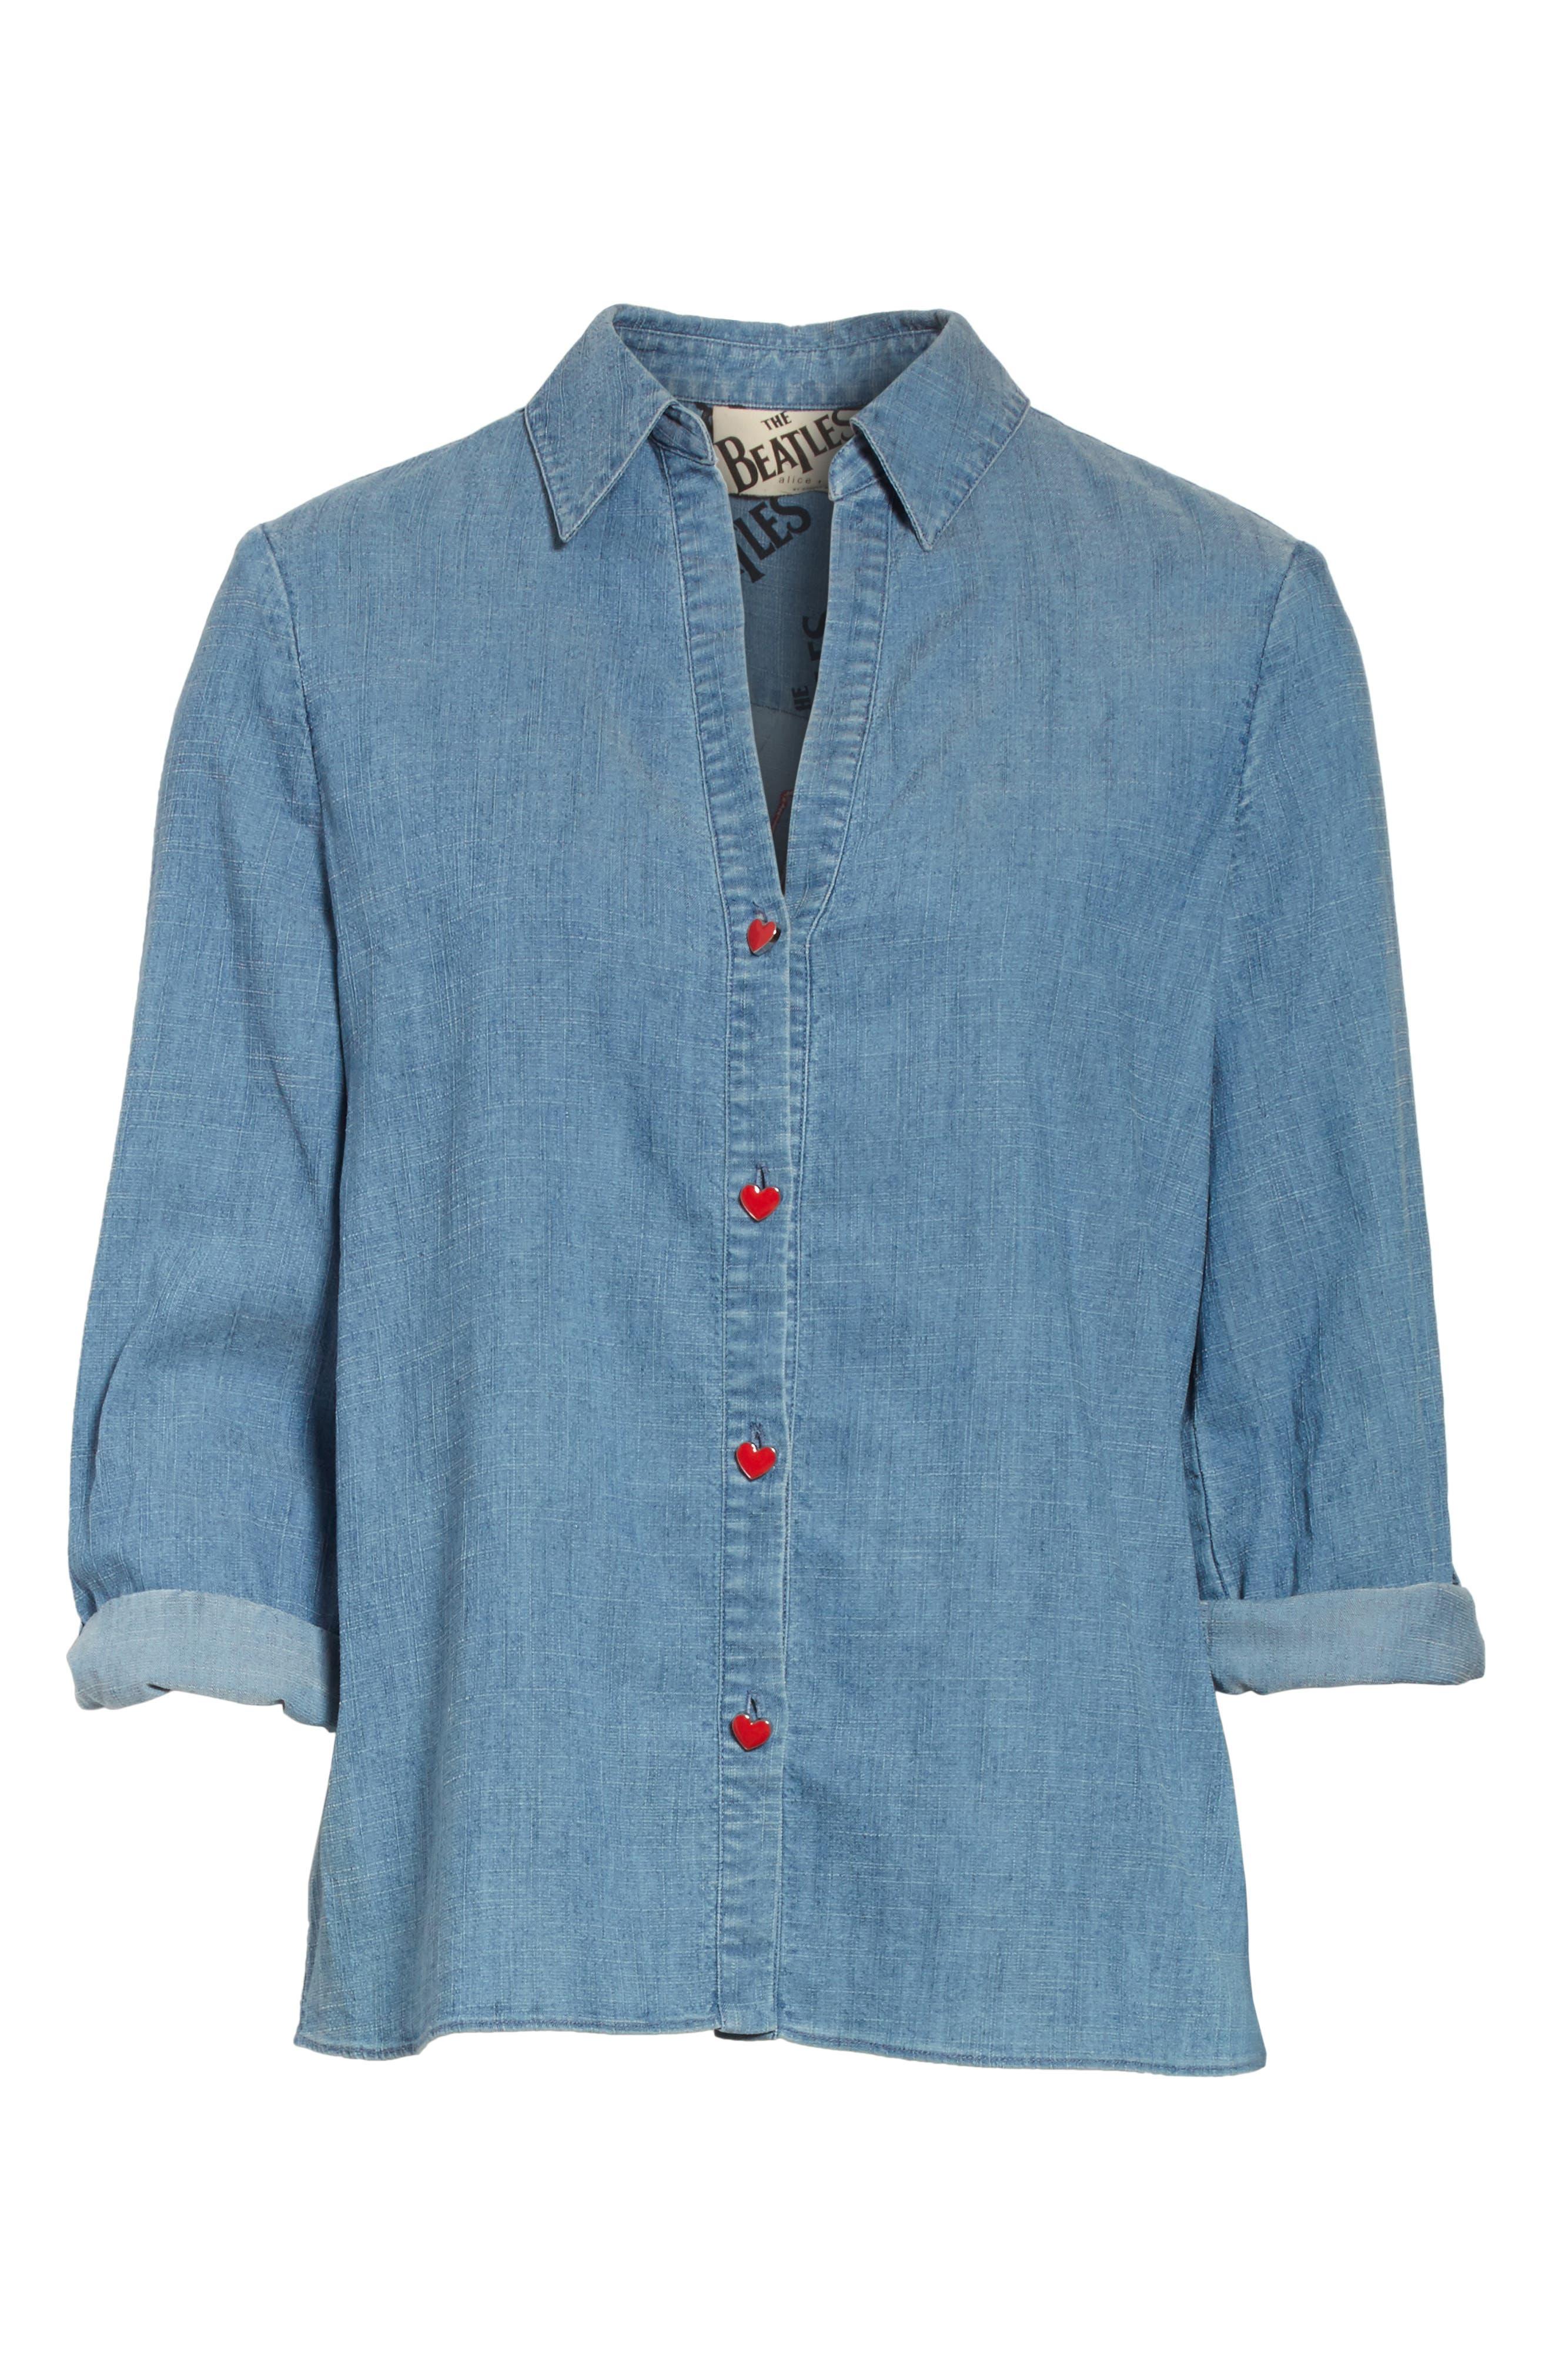 Eloise Appliqué Roll-Cuff Shirt,                             Alternate thumbnail 6, color,                             484